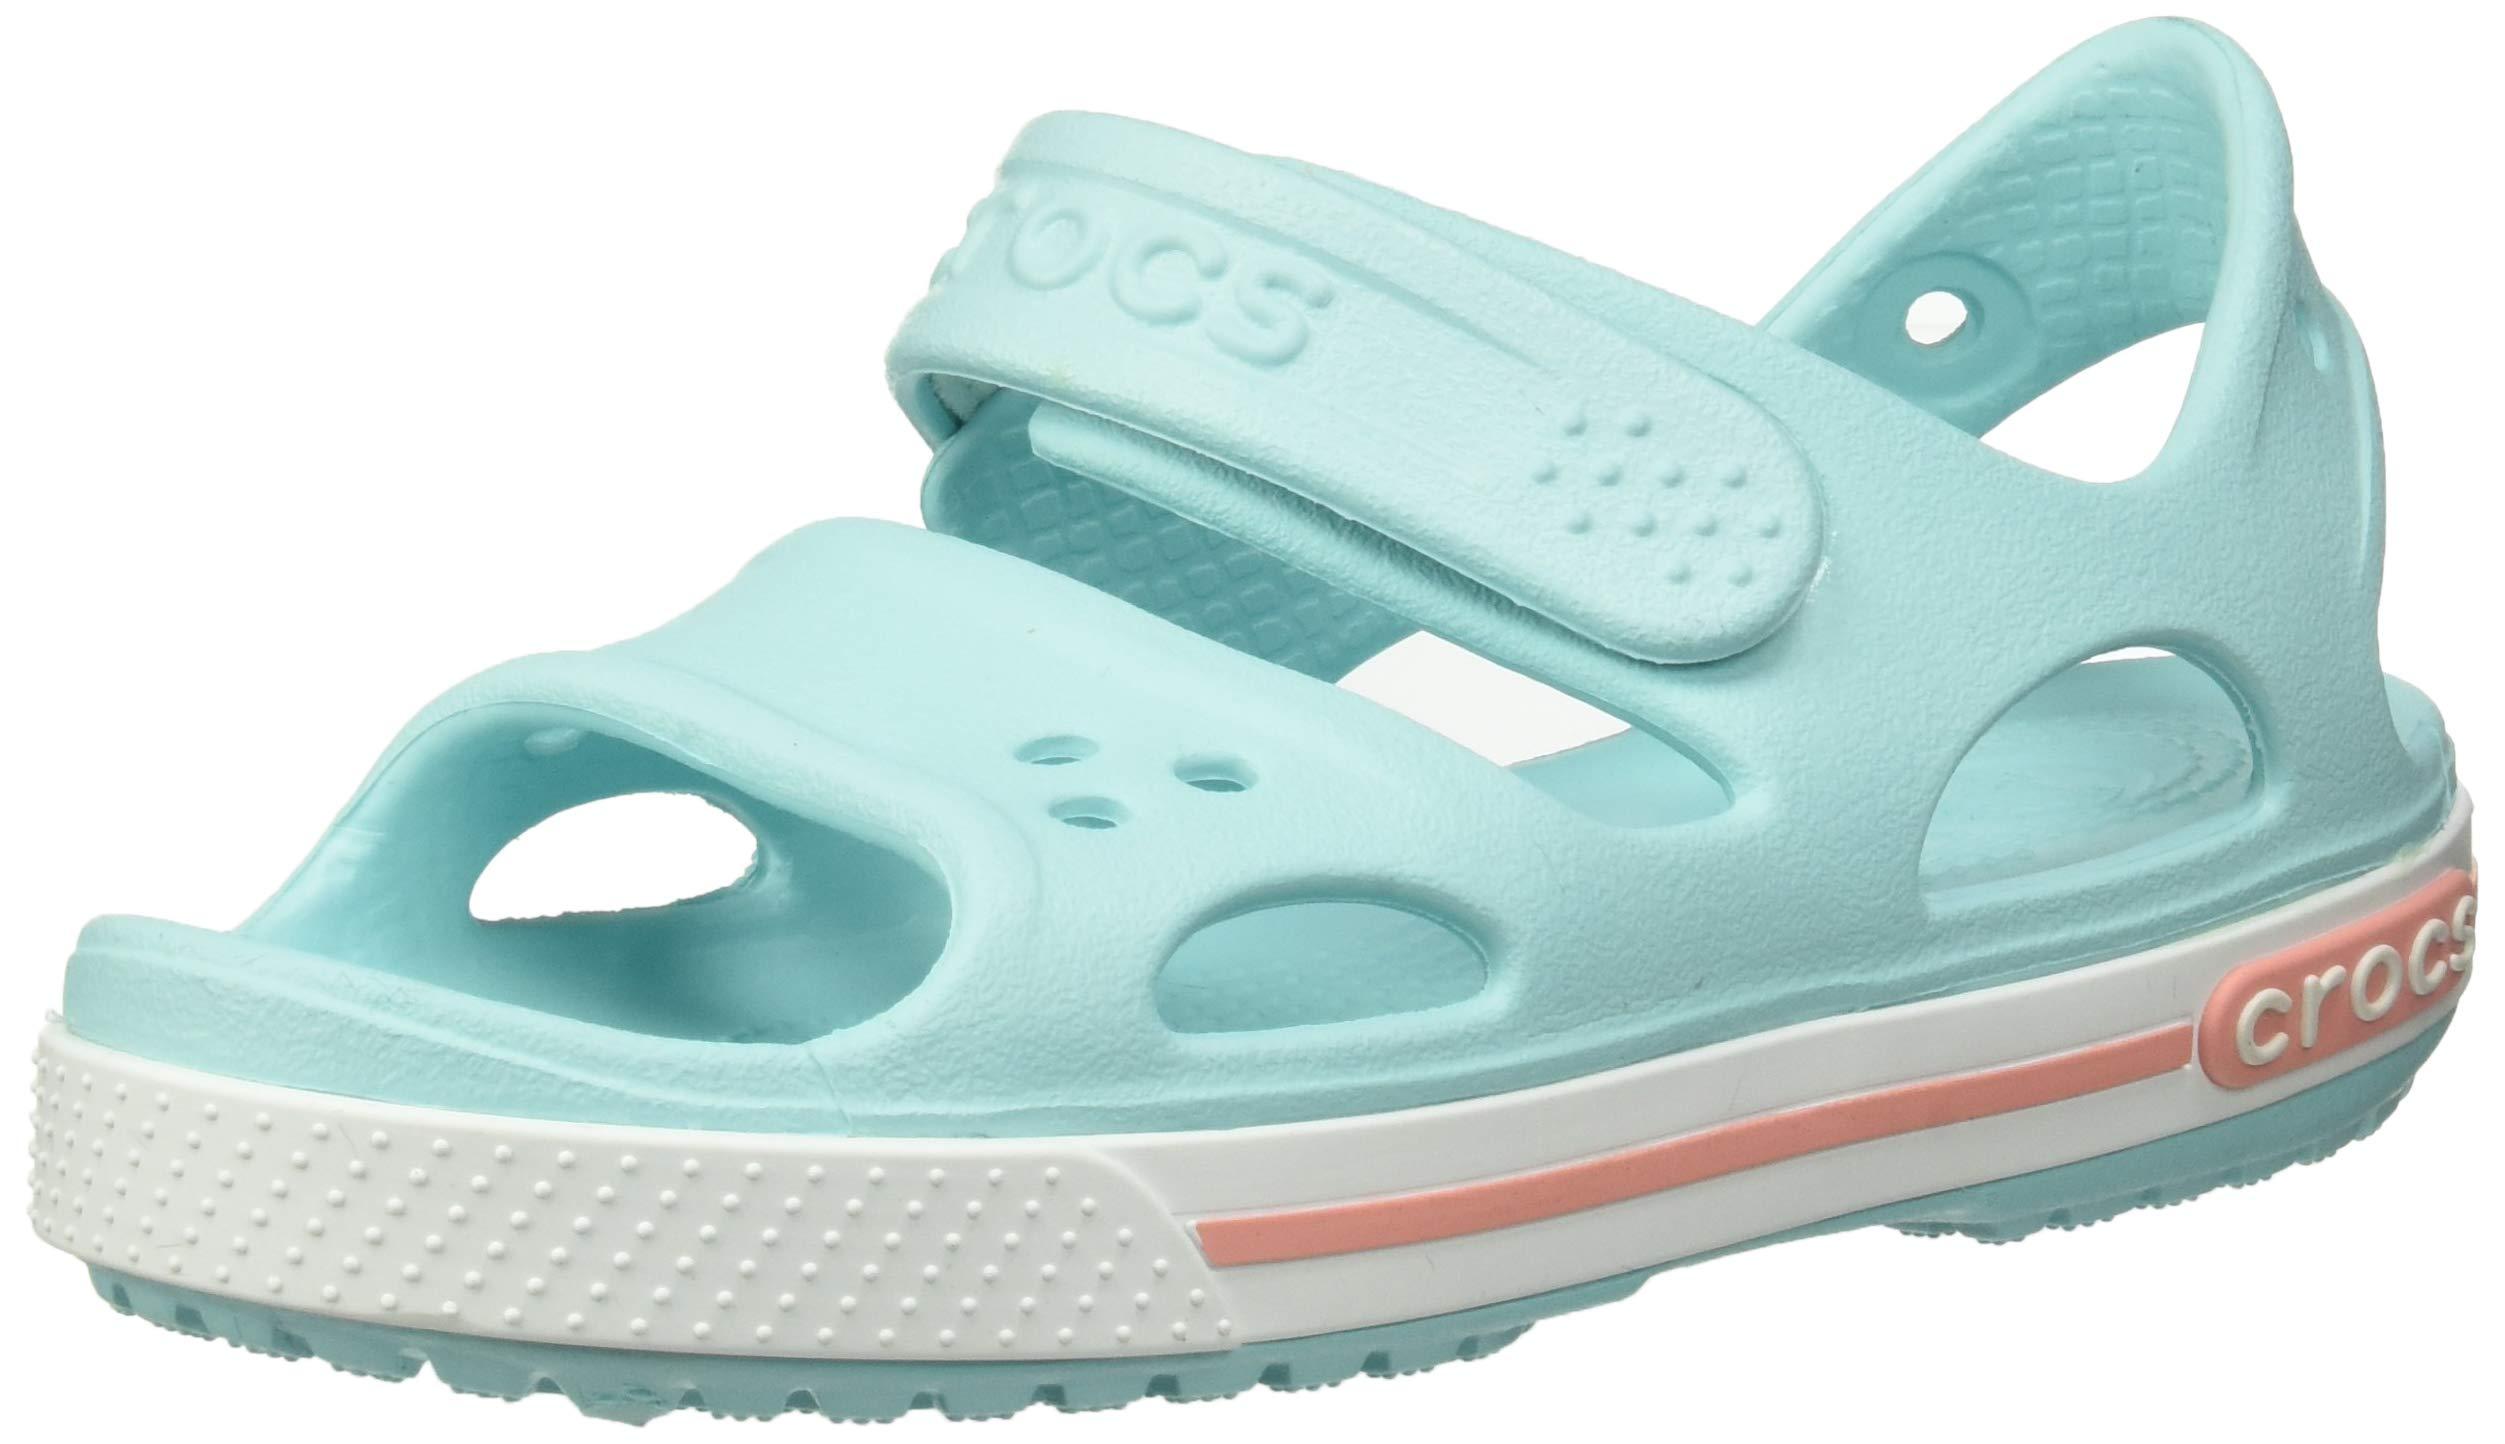 Crocs Kid's Boys and Girls Crocband II Sandal | Pre School Water Shoe Ice Blue 7 M US Toddler